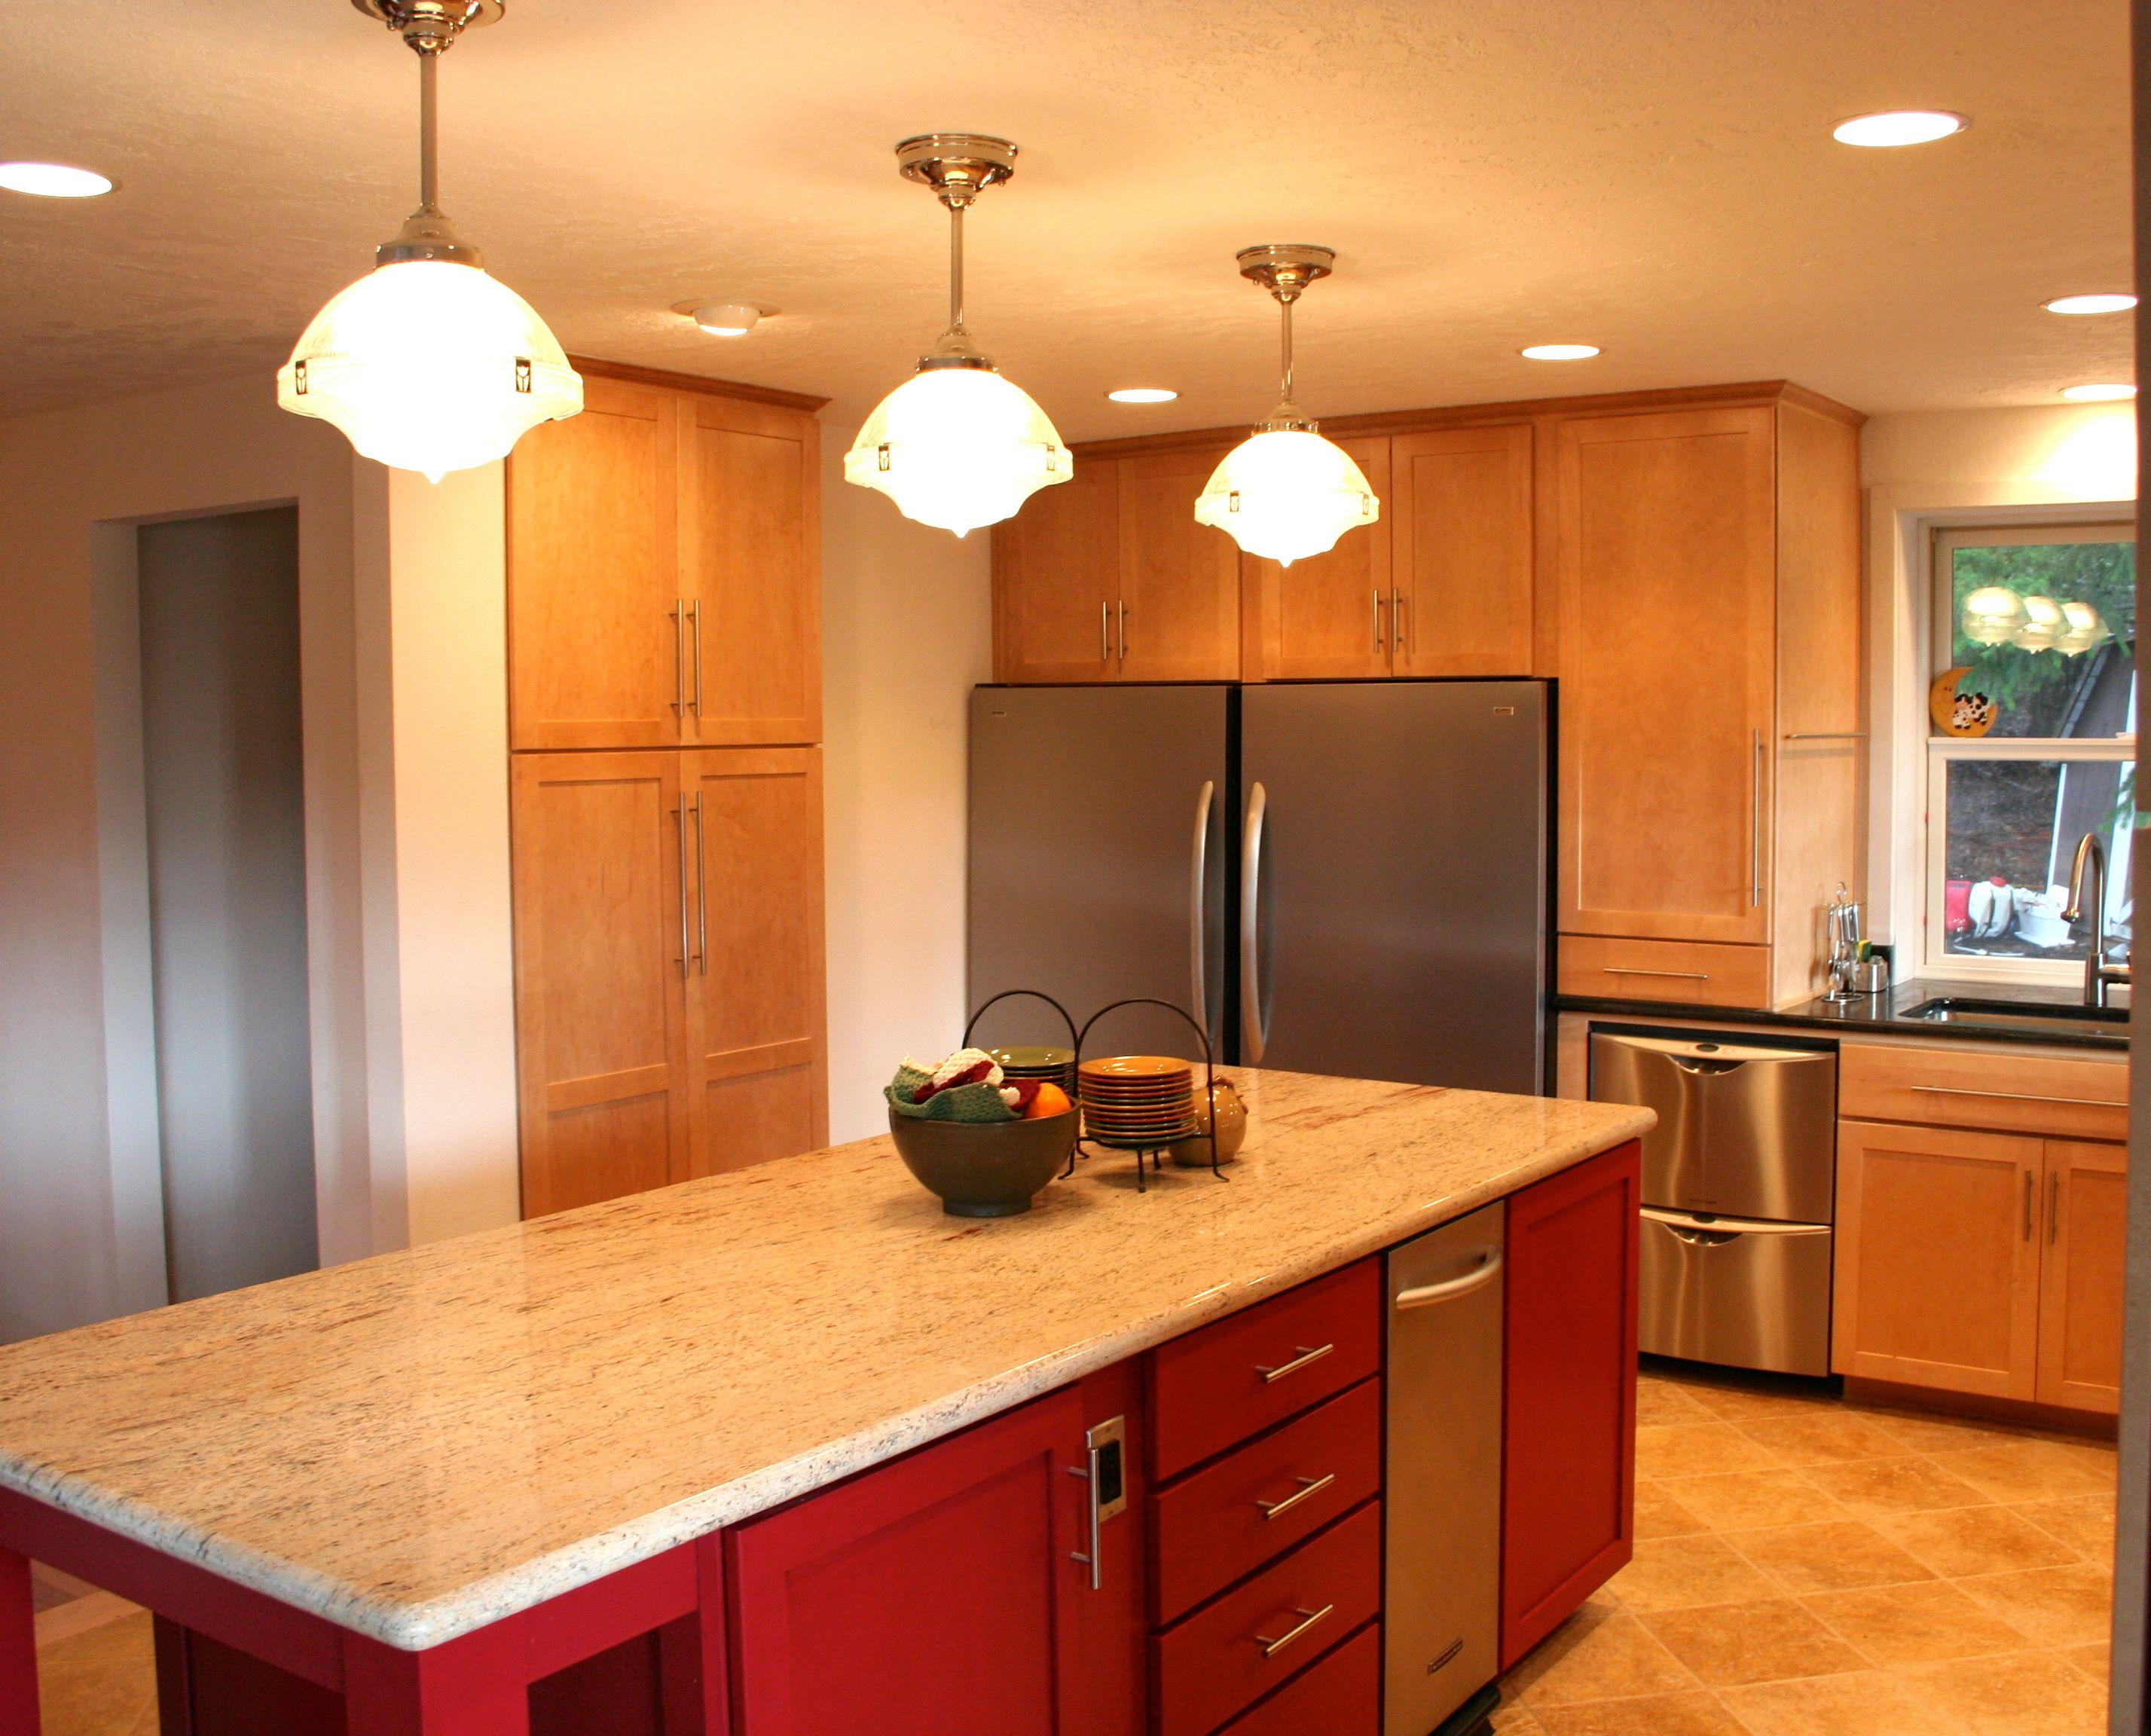 Cbi Remodel Salem Or Kitchen Remodel Kitchen Cabinets Kitchen